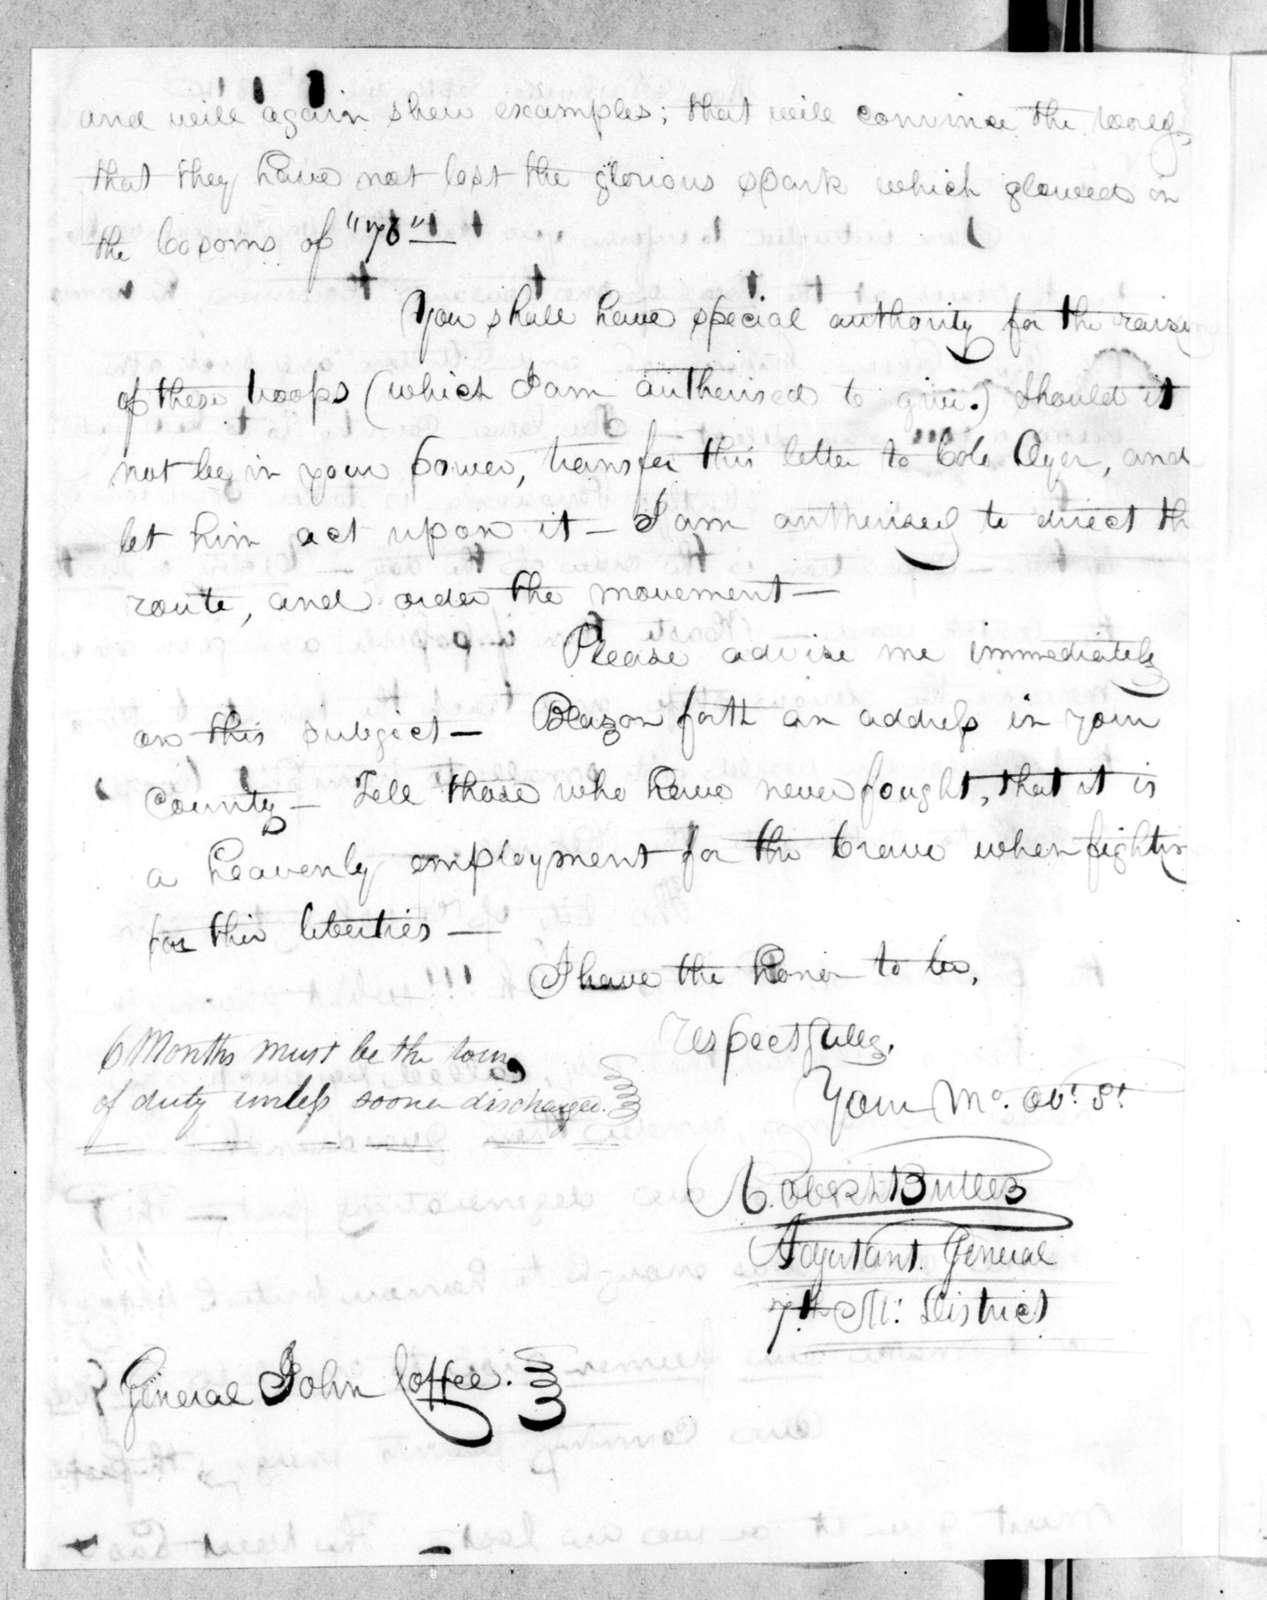 Robert Butler to John Coffee, September 10, 1814